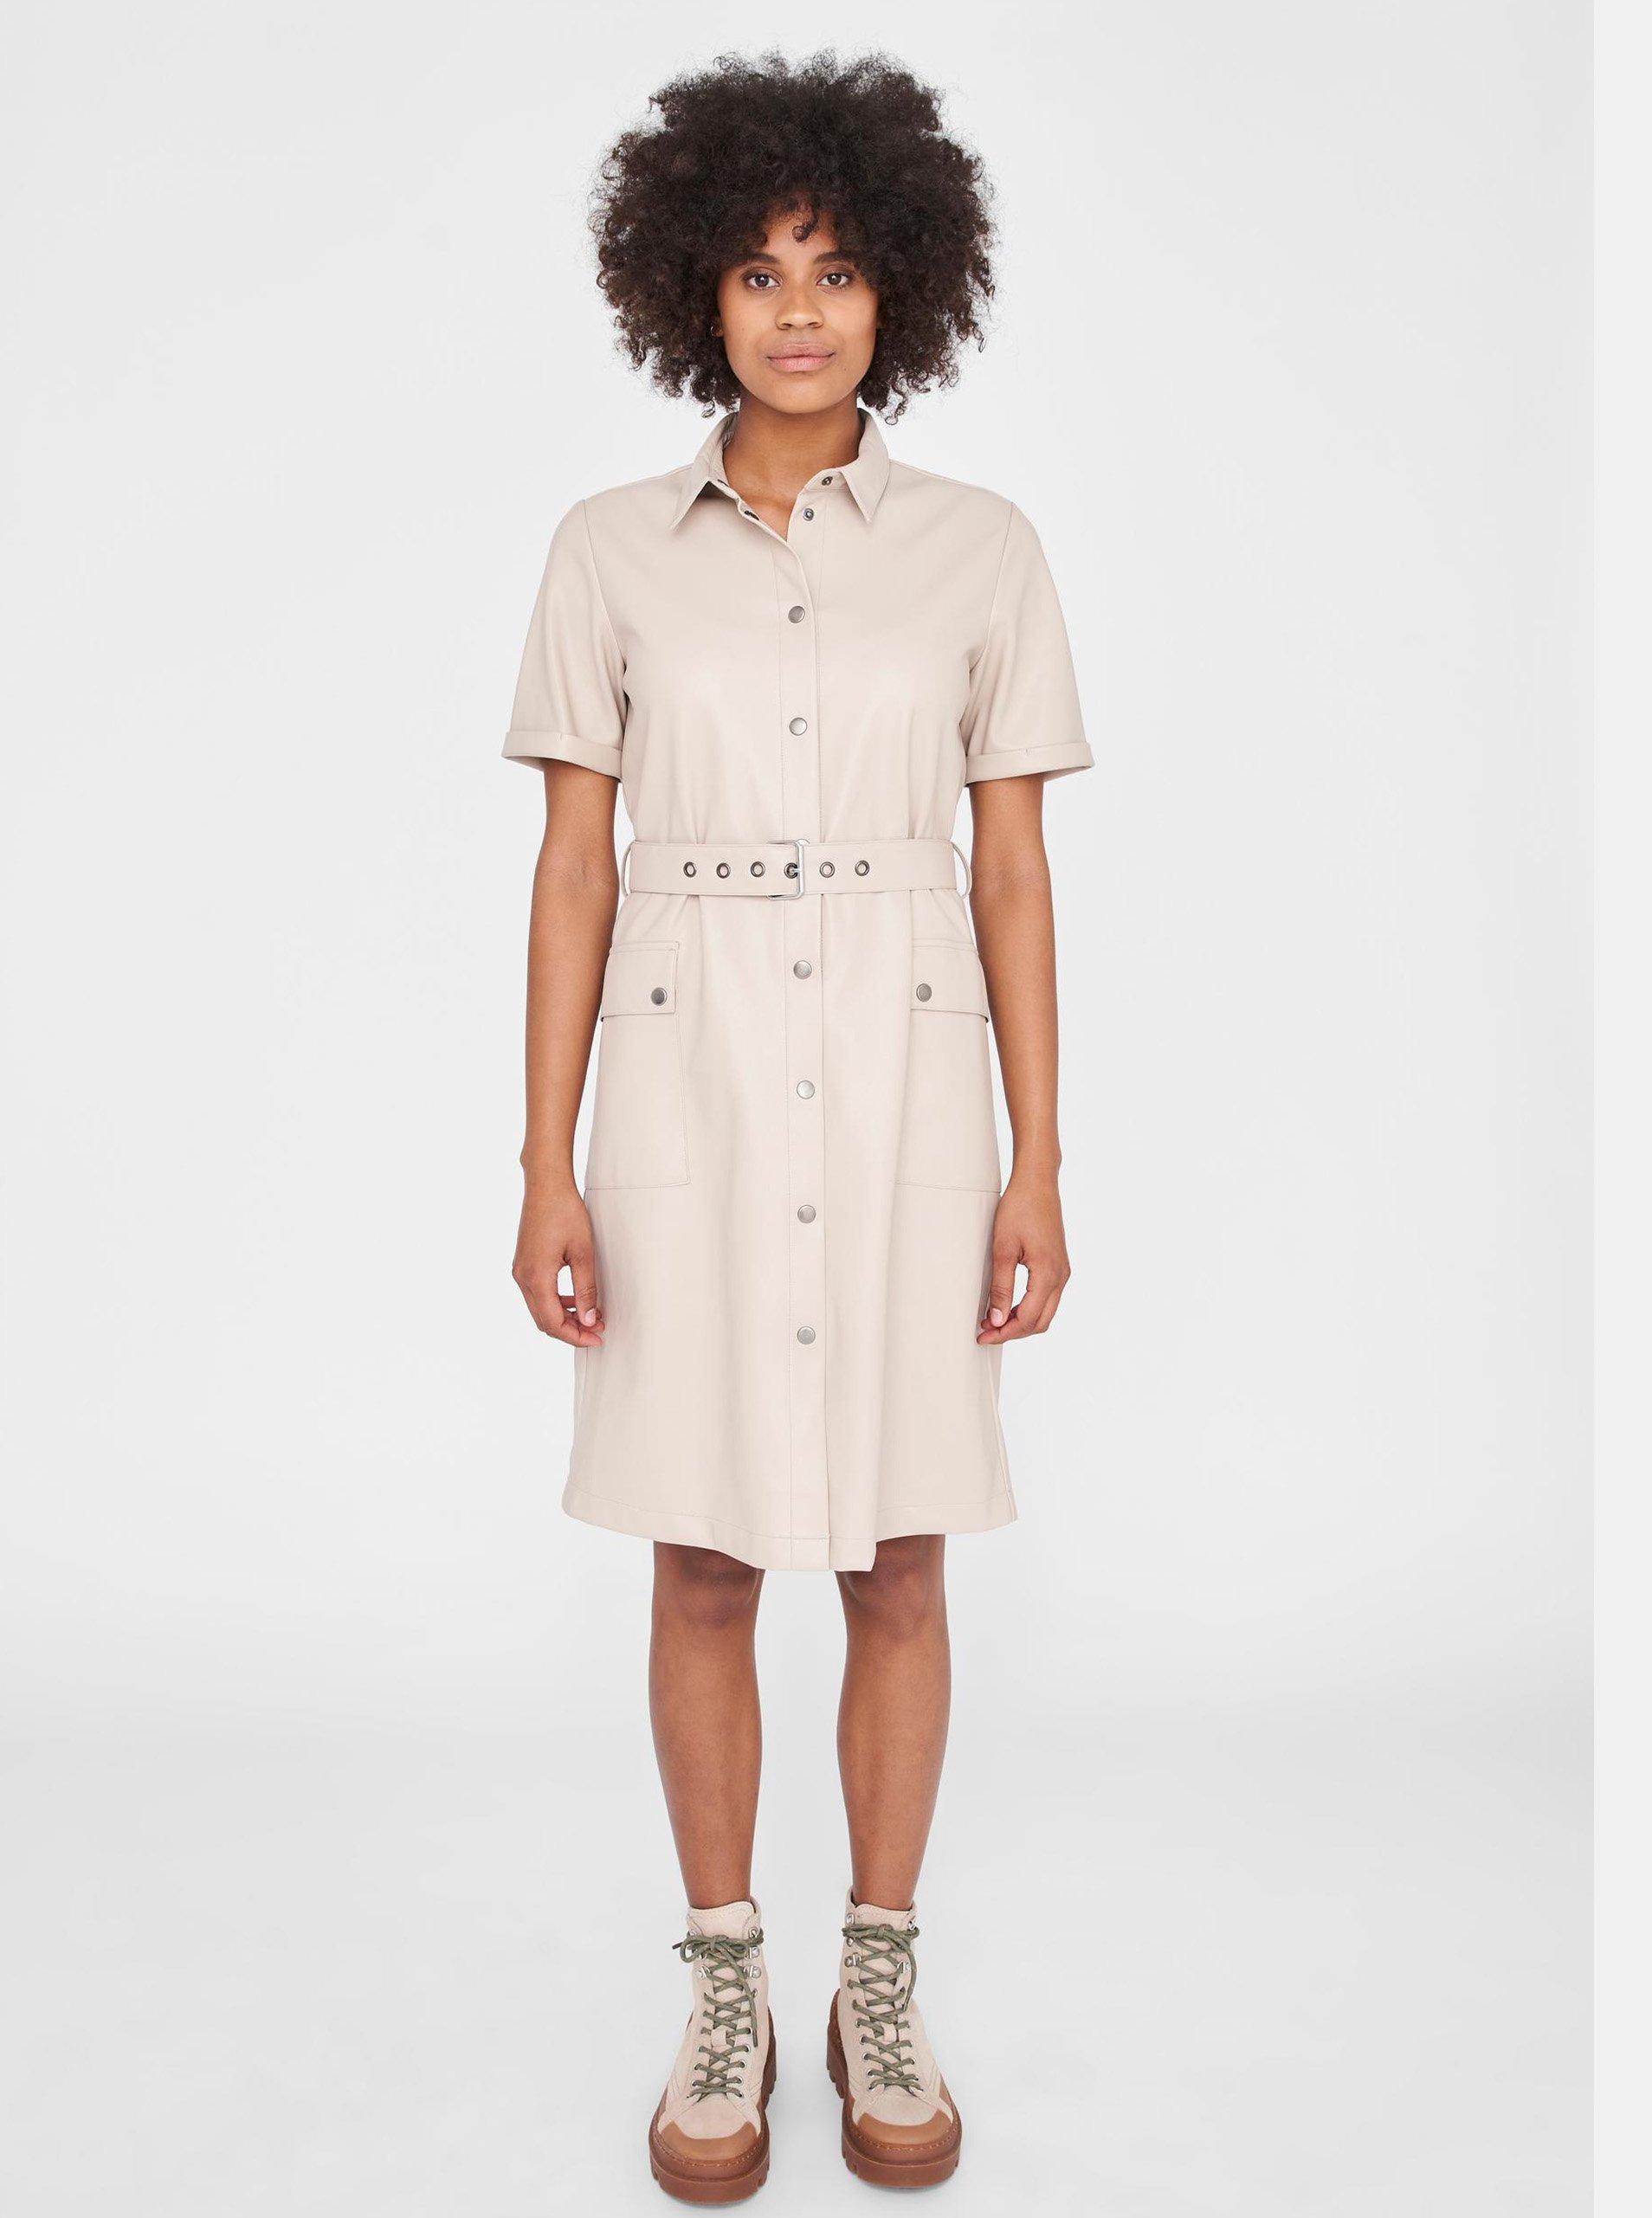 Béžové koženkové košeľové šaty Noisy May.